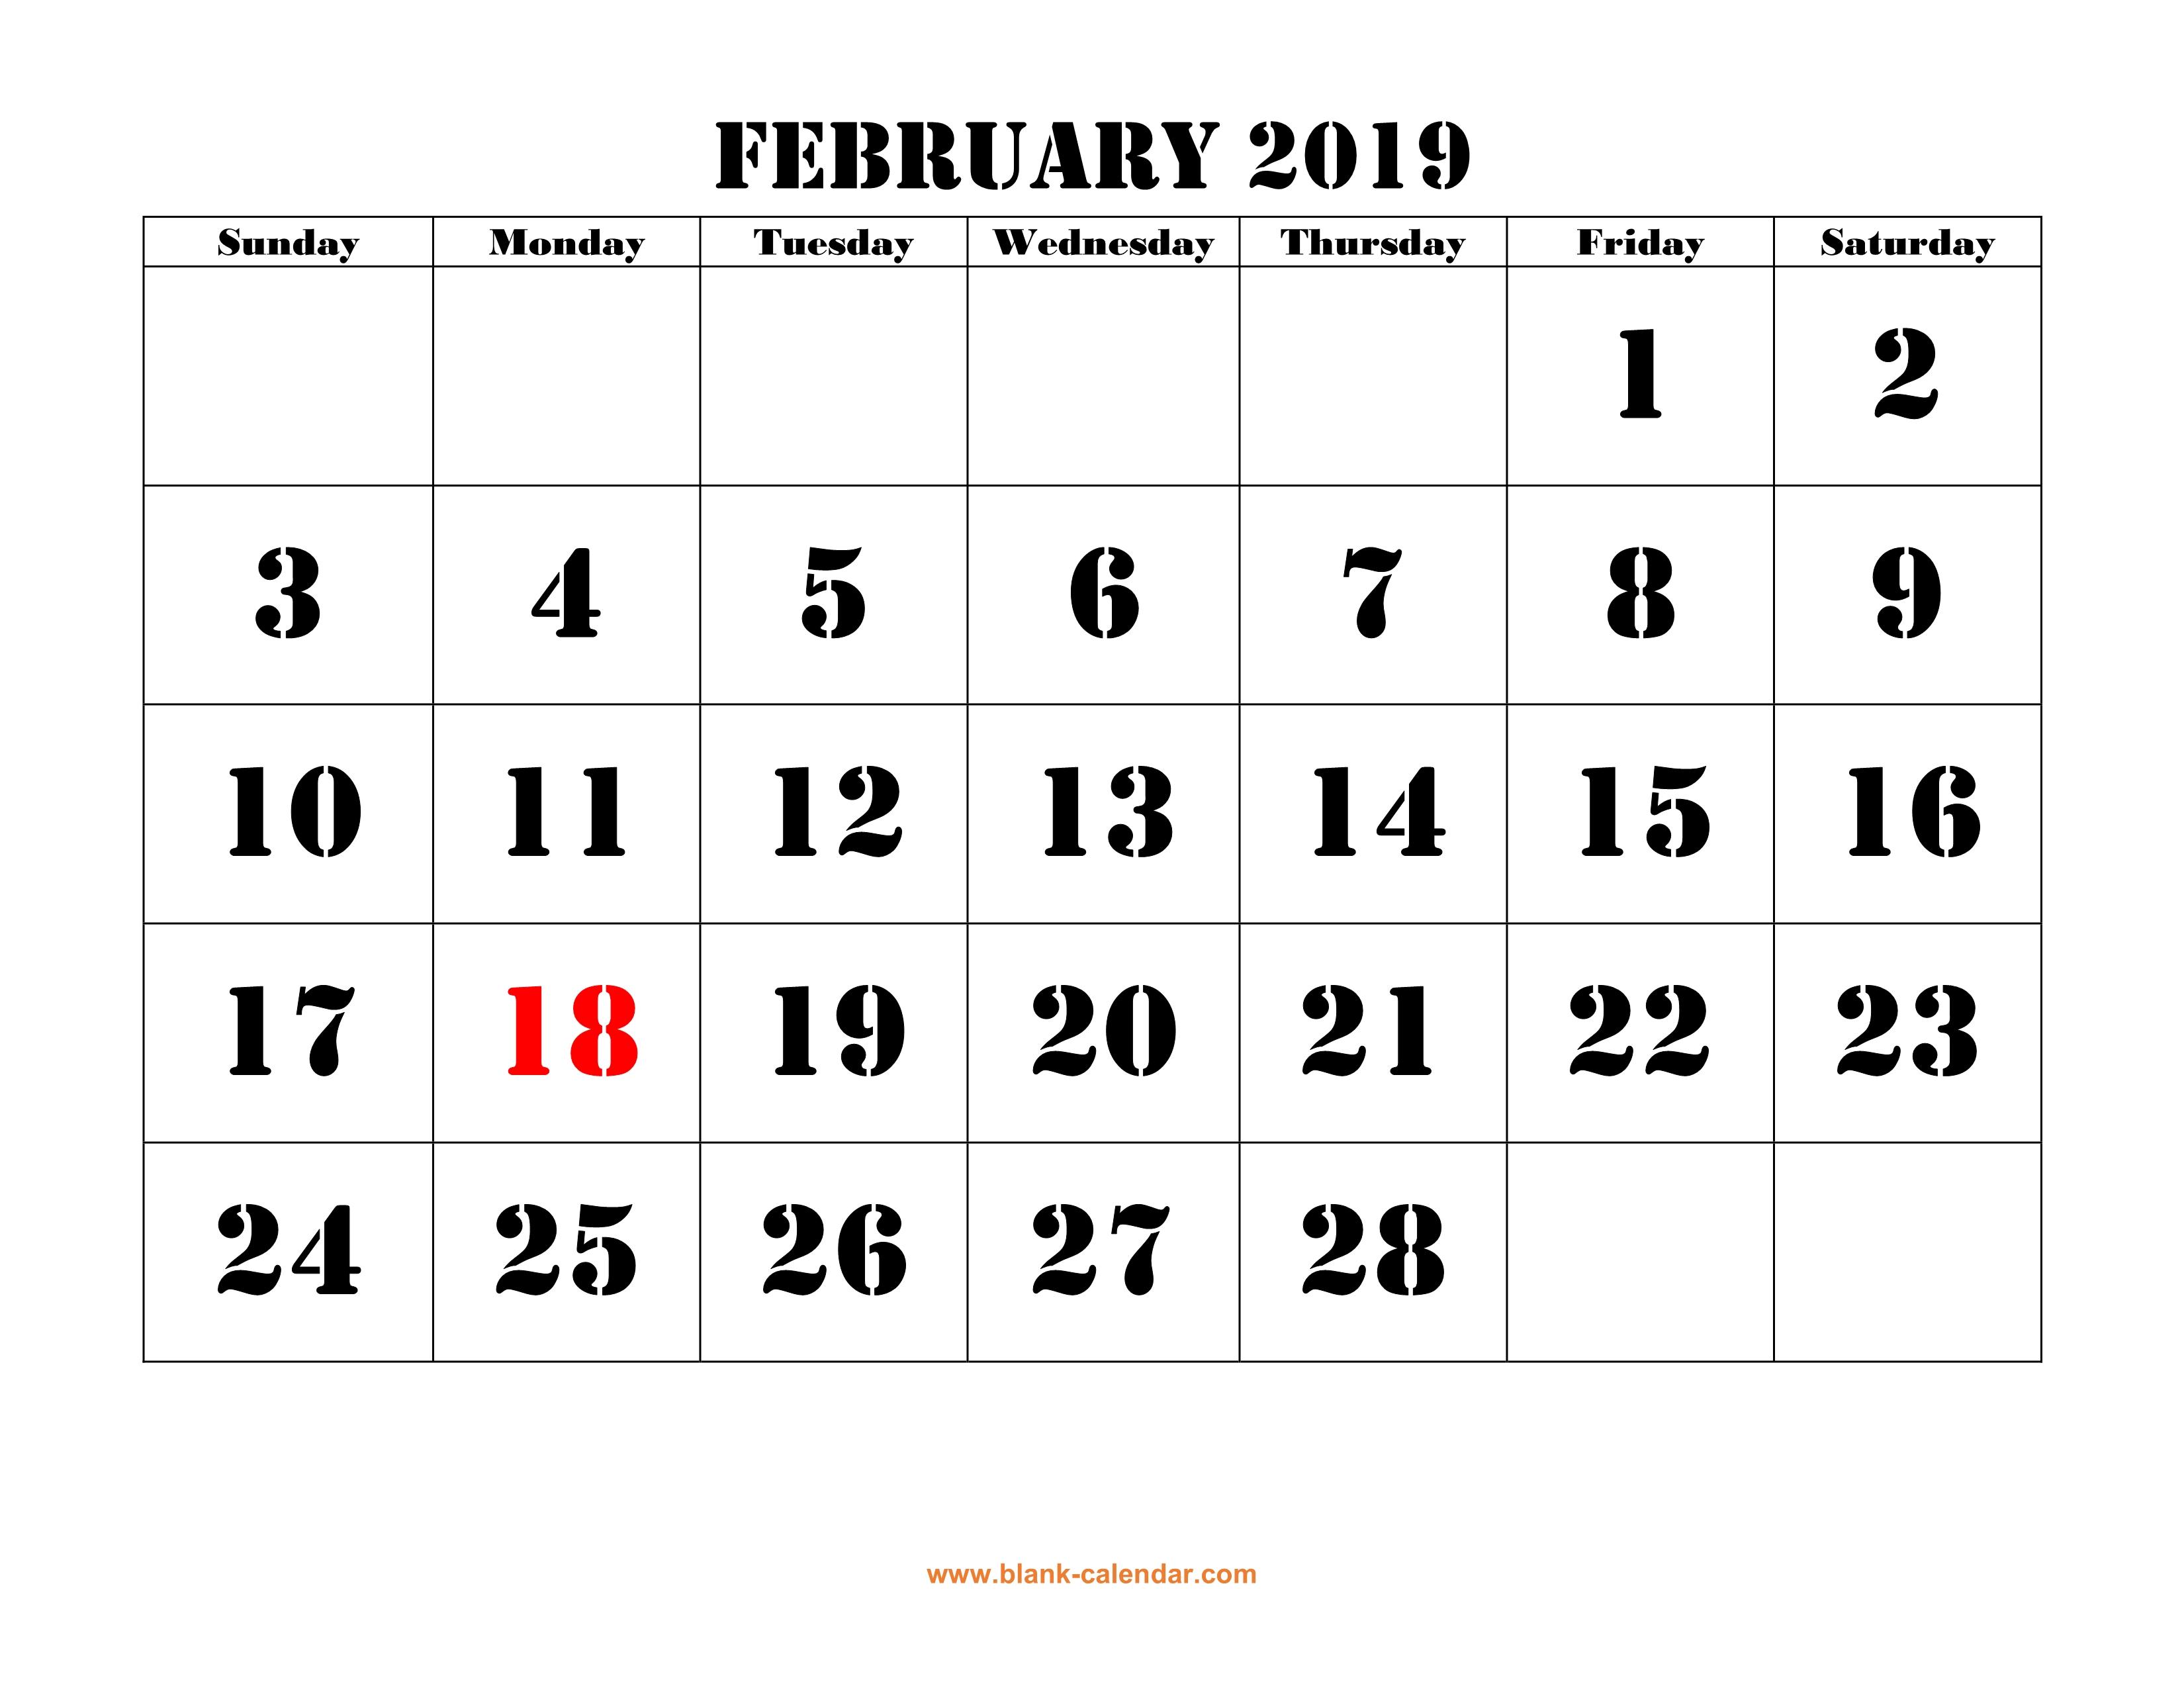 Free Download Printable February 2019 Calendar, Large Font